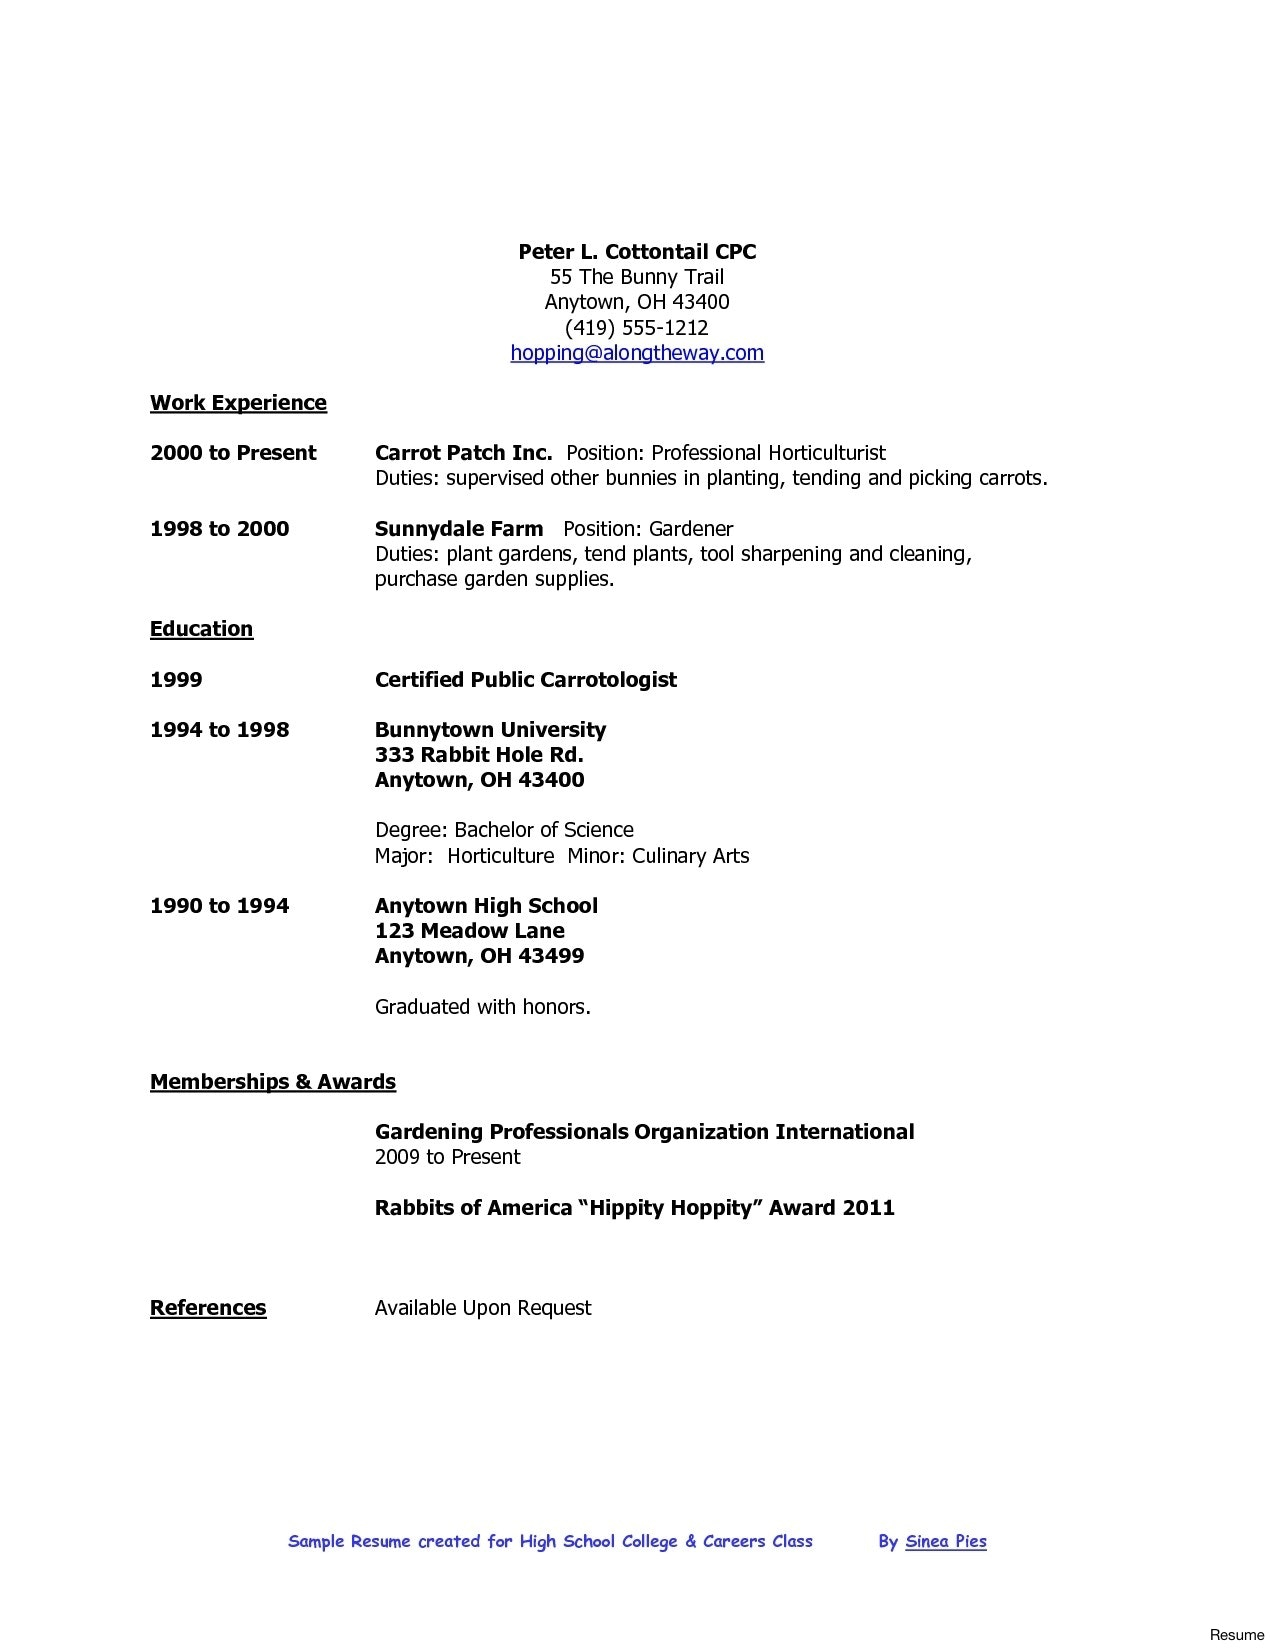 Resume Format High School Graduate